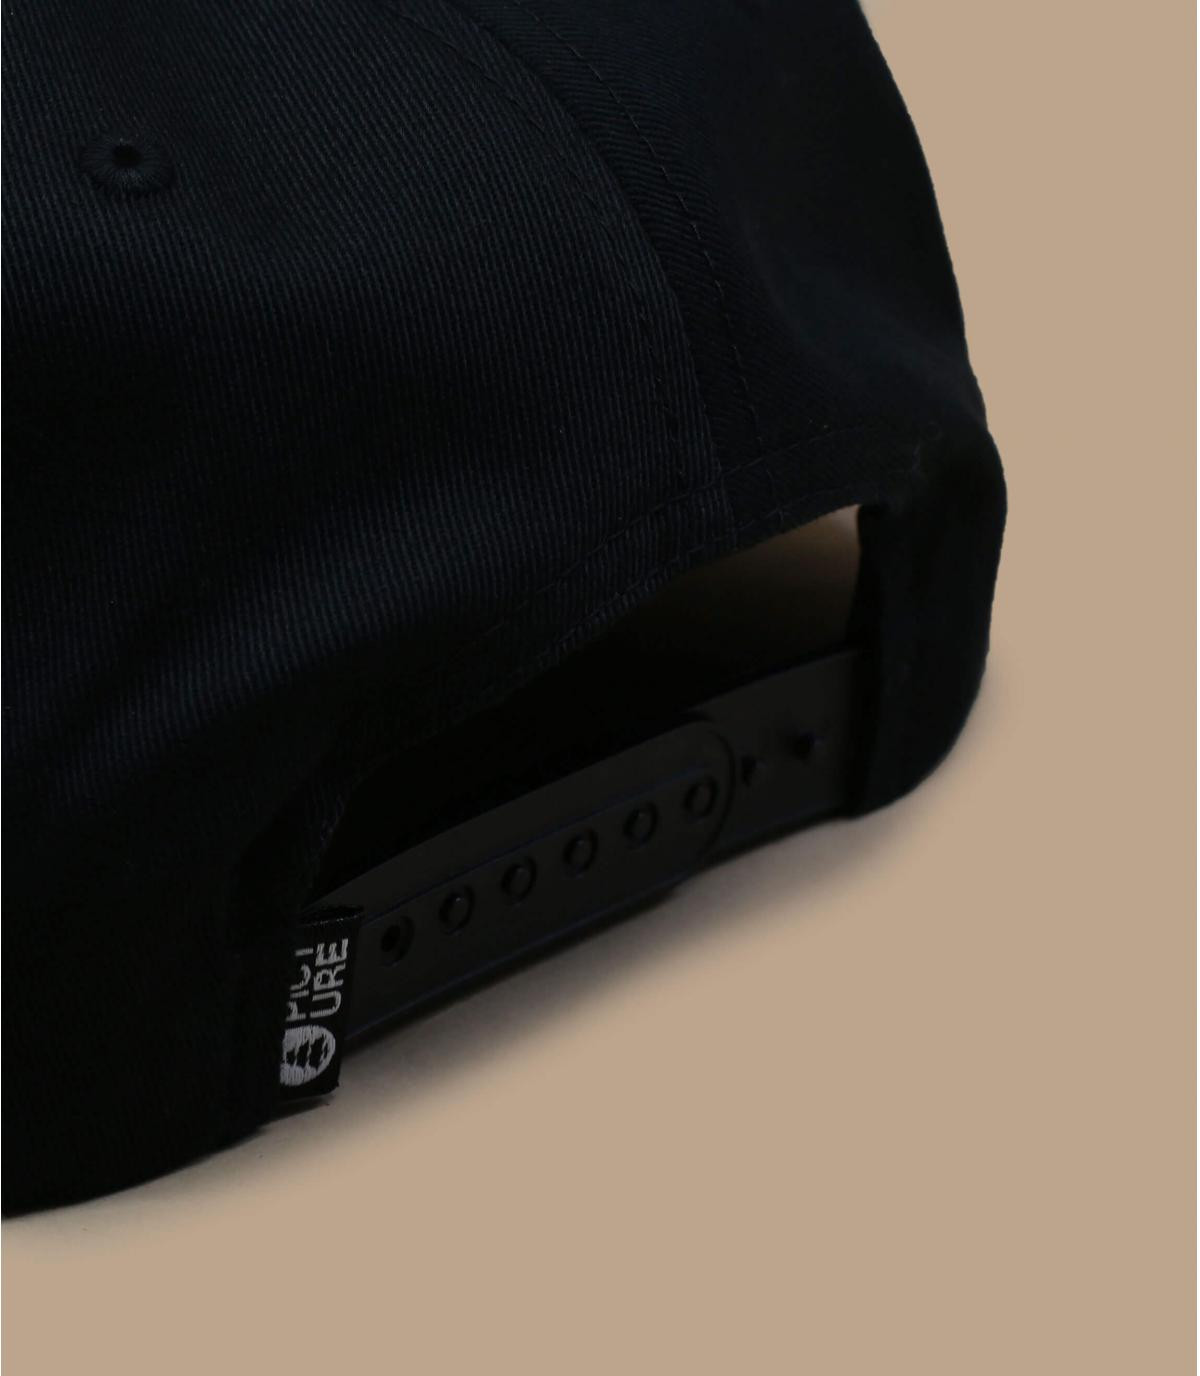 Detalles Qilo black imagen 4